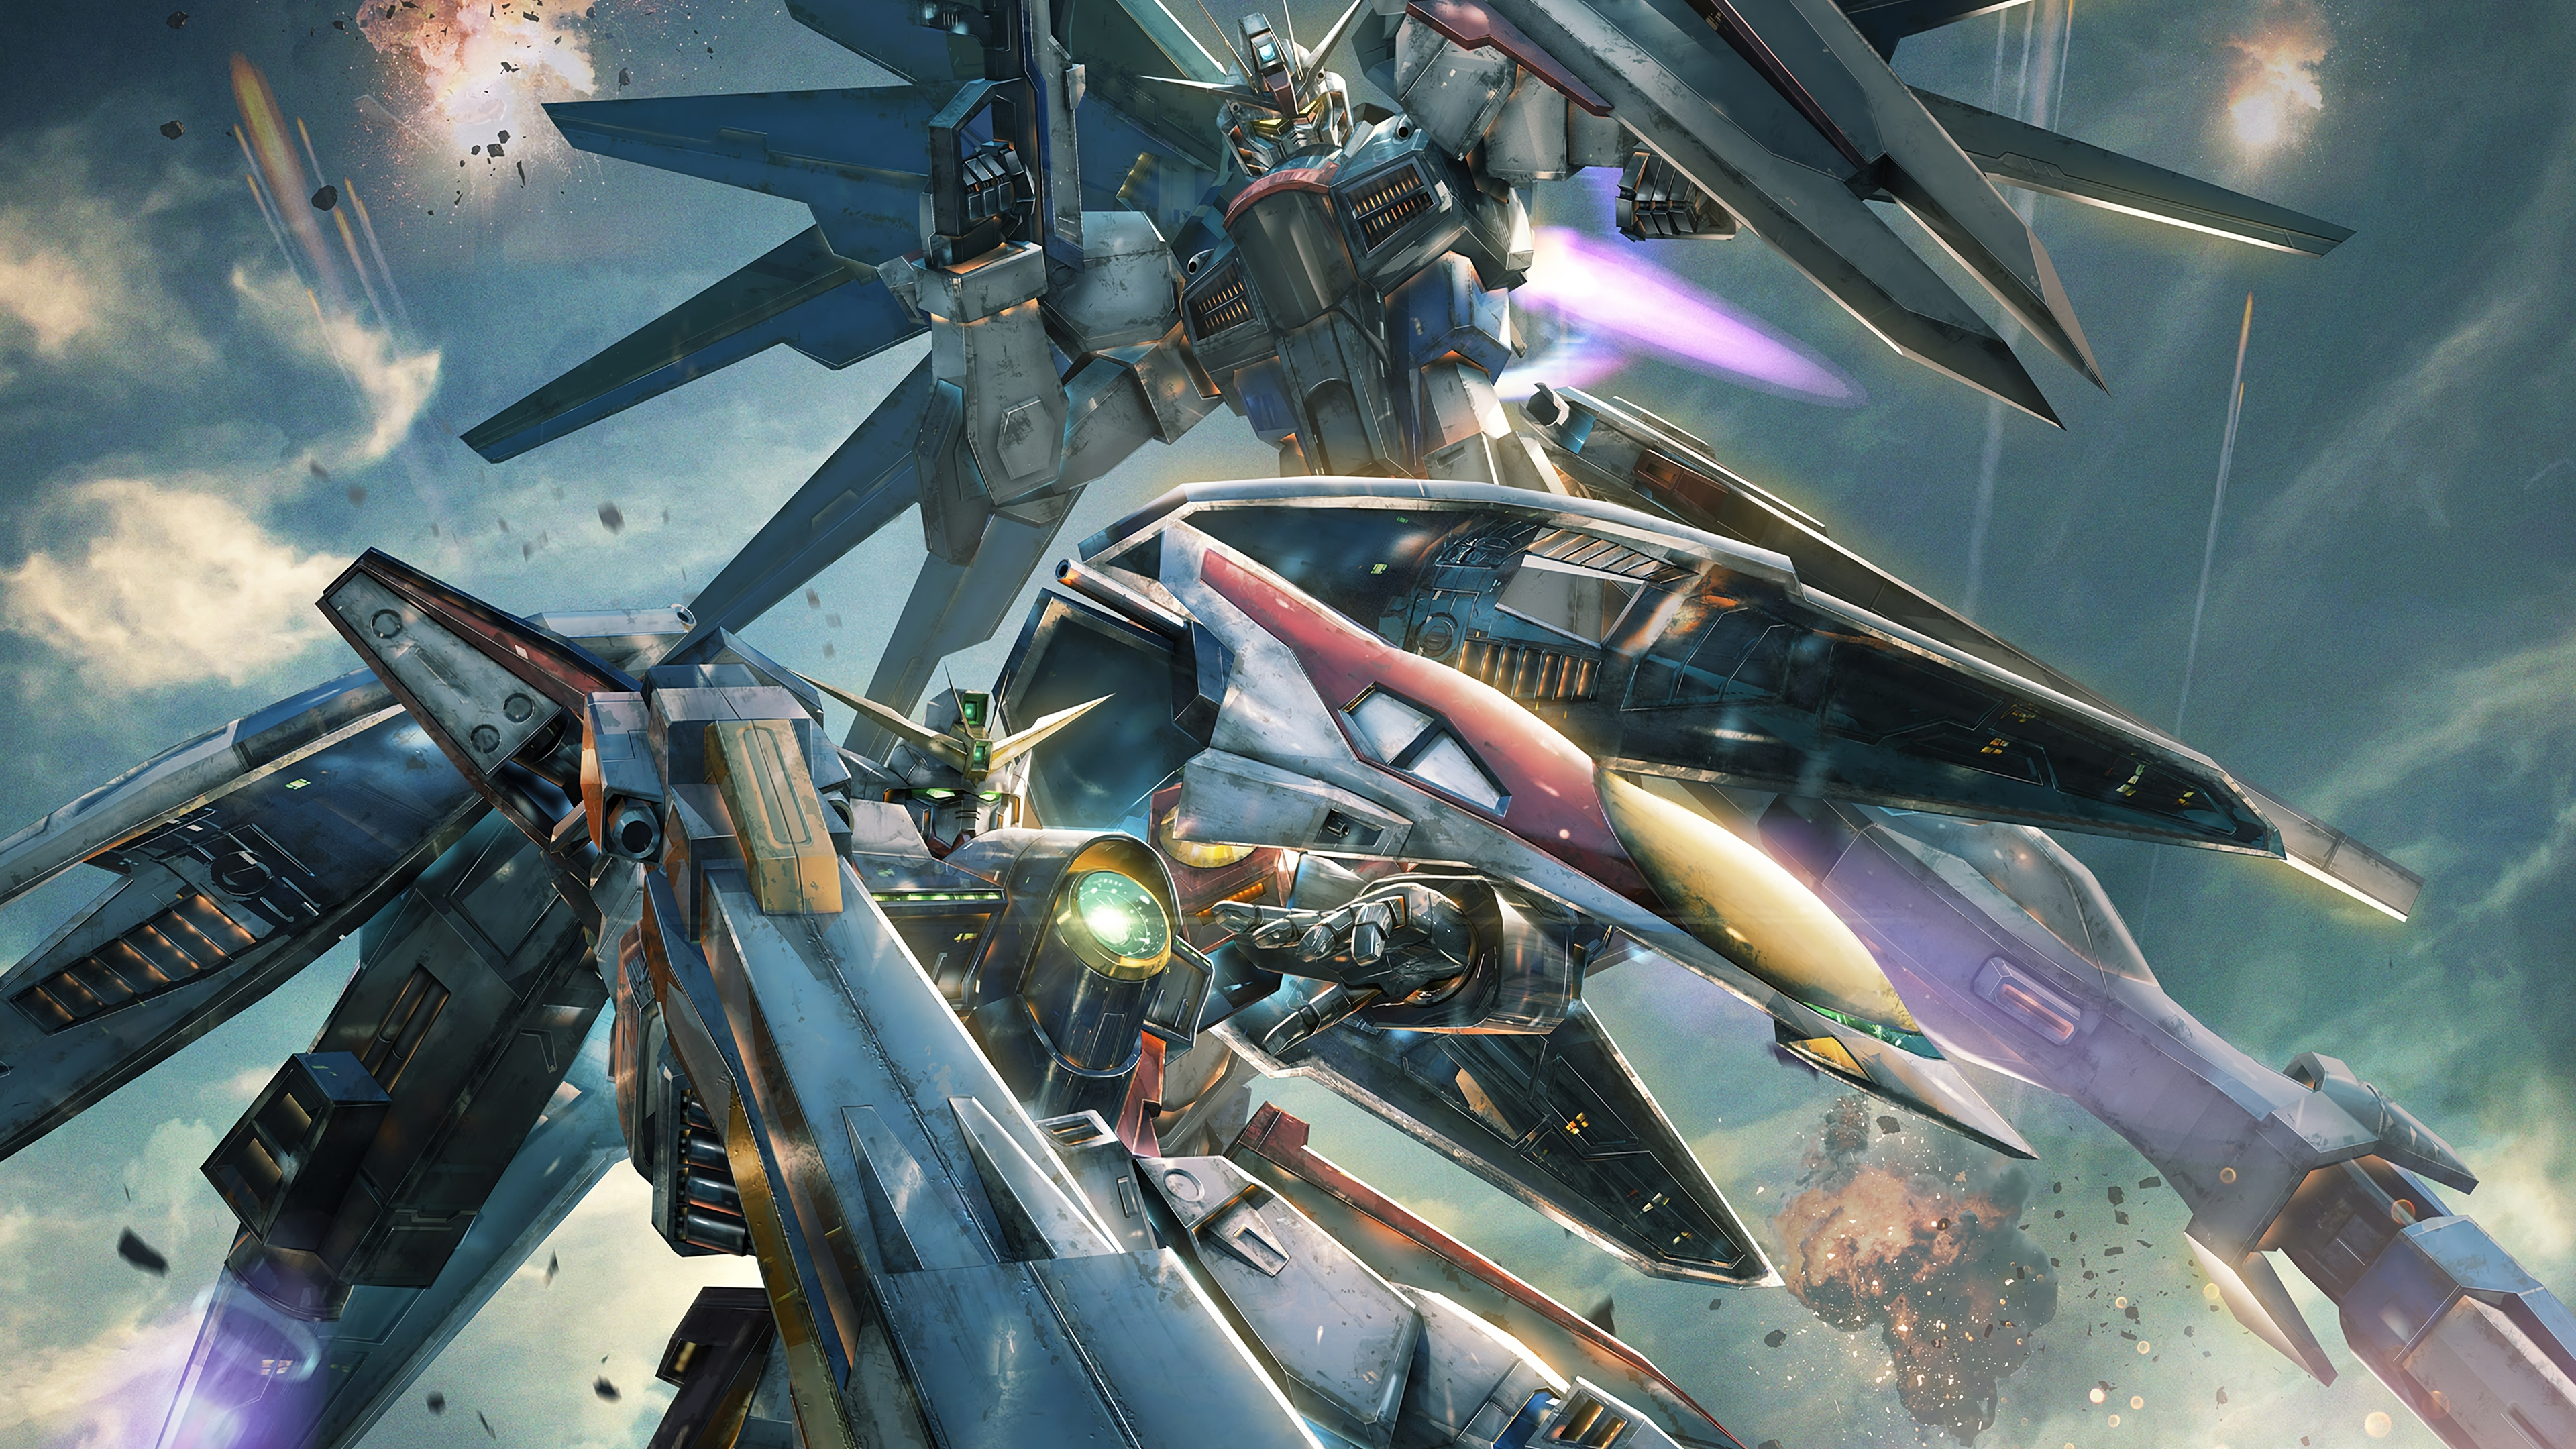 Custom Wallpaper 4k Pubattlegrounds: Gundam Versus 2017 4k, HD Games, 4k Wallpapers, Images